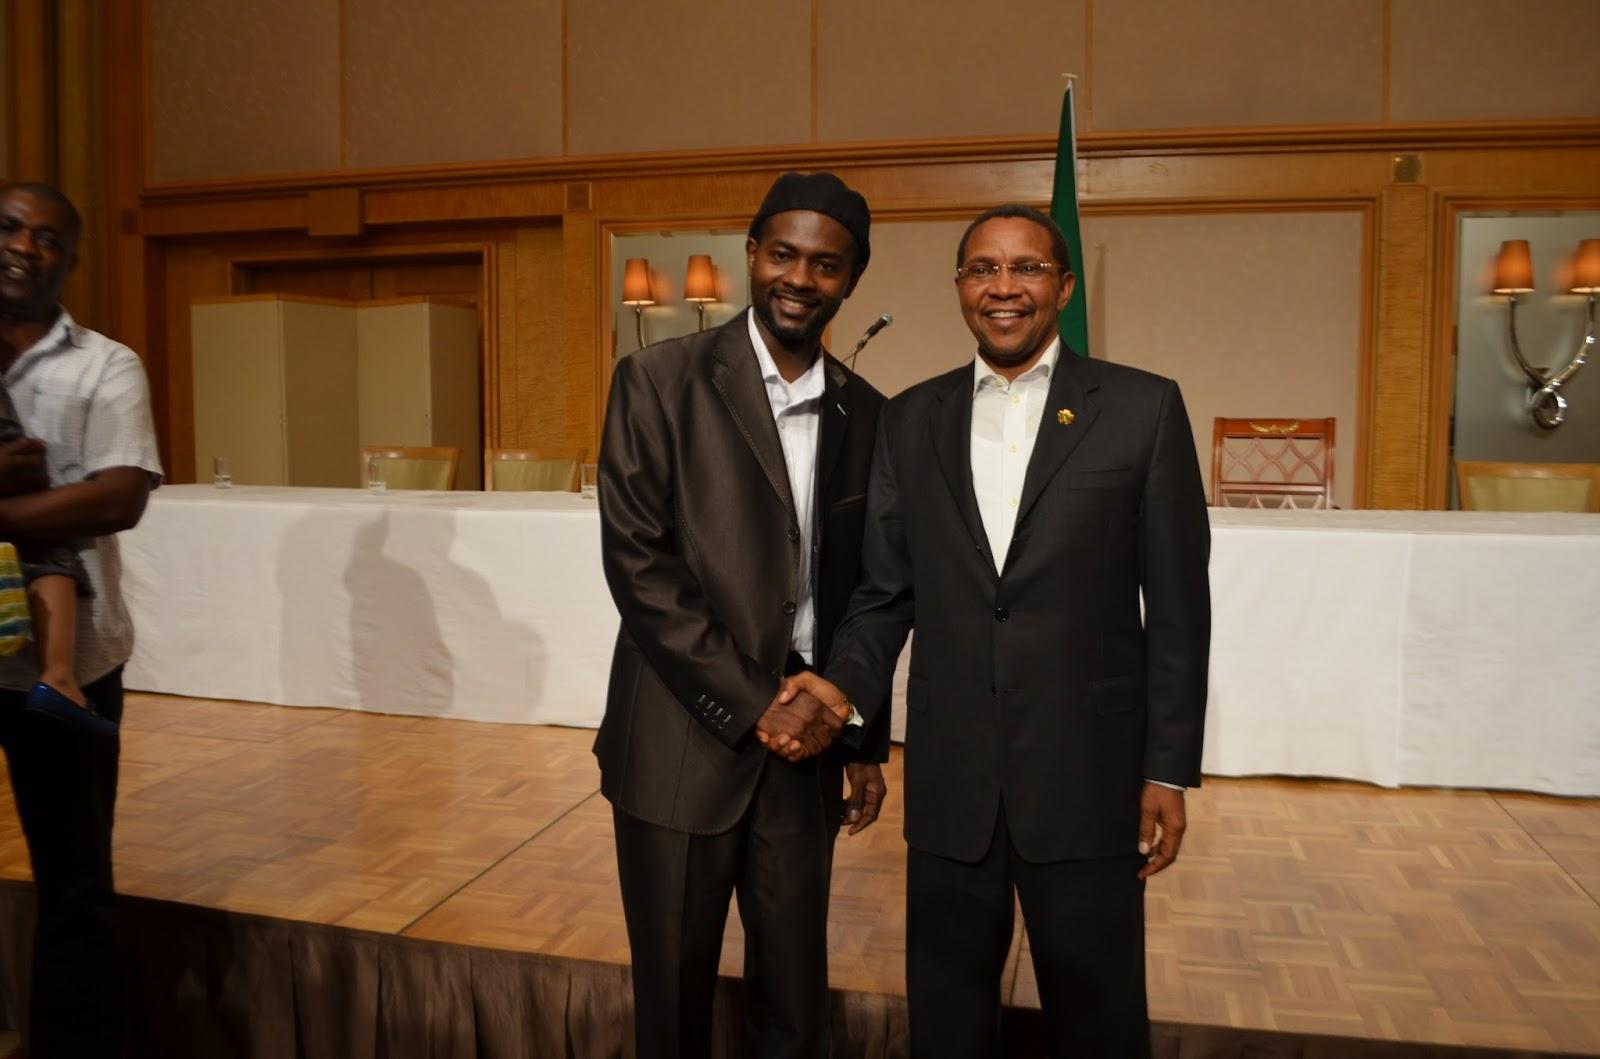 Wabongo Uchi http://genuardis.net/picha/picha-wabongo.htm